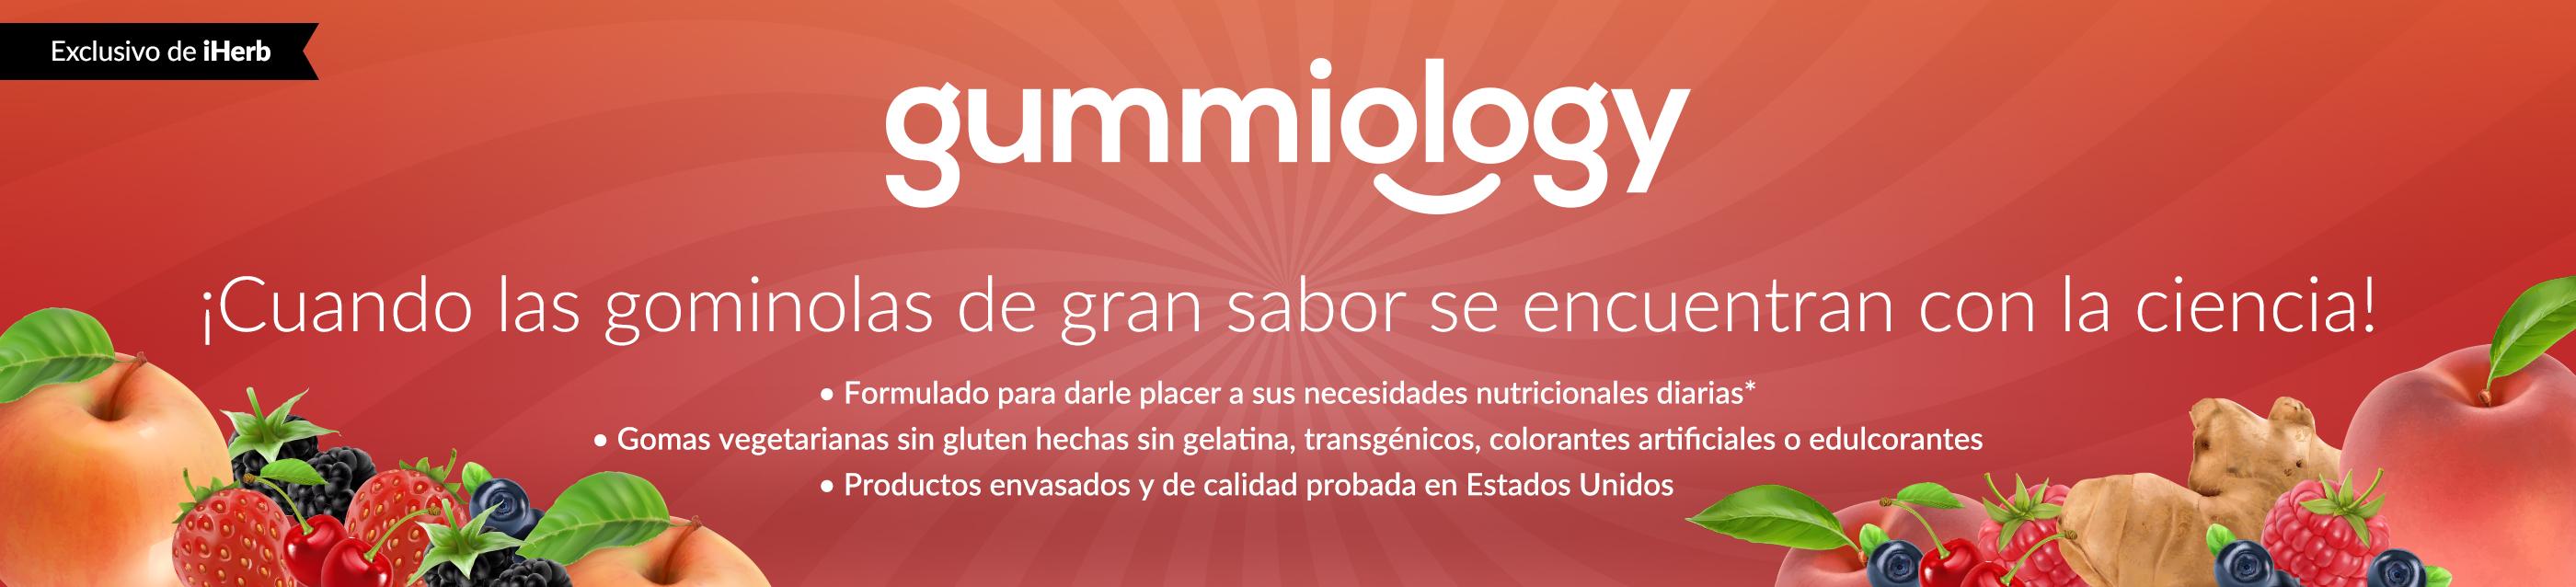 Gummiology main banner